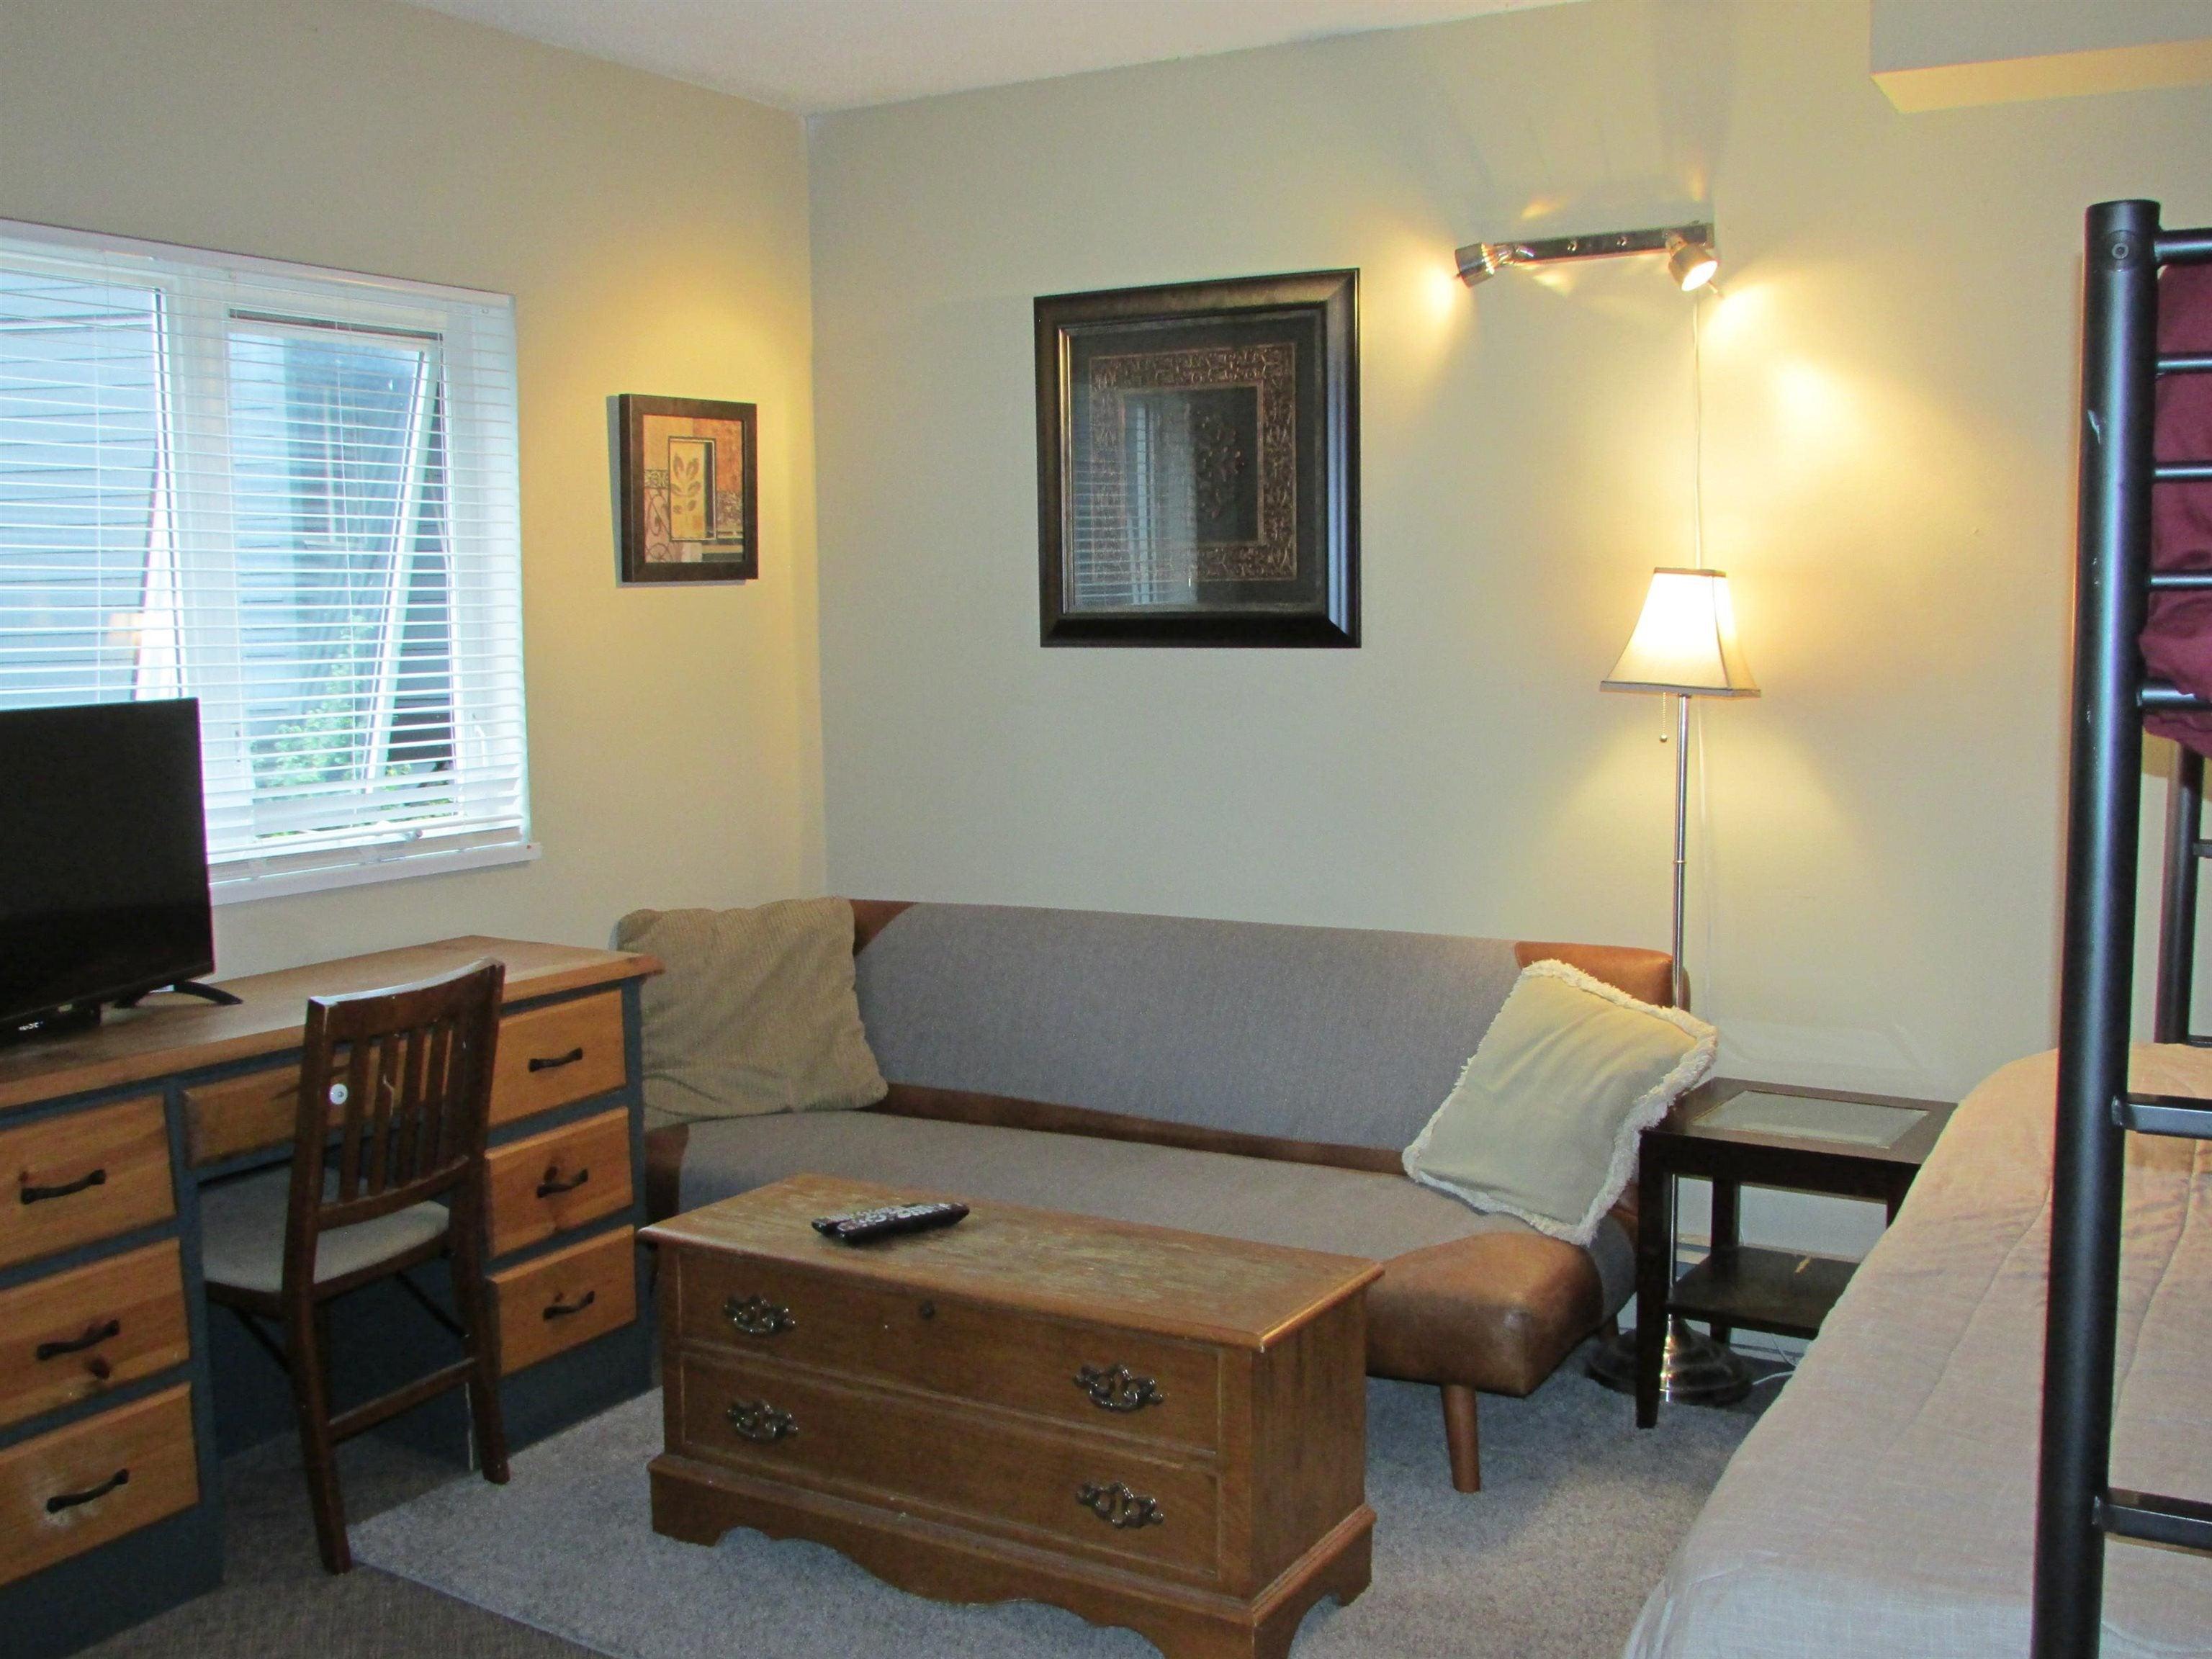 318 2111 WHISTLER ROAD - Nordic Apartment/Condo for sale(R2616819)